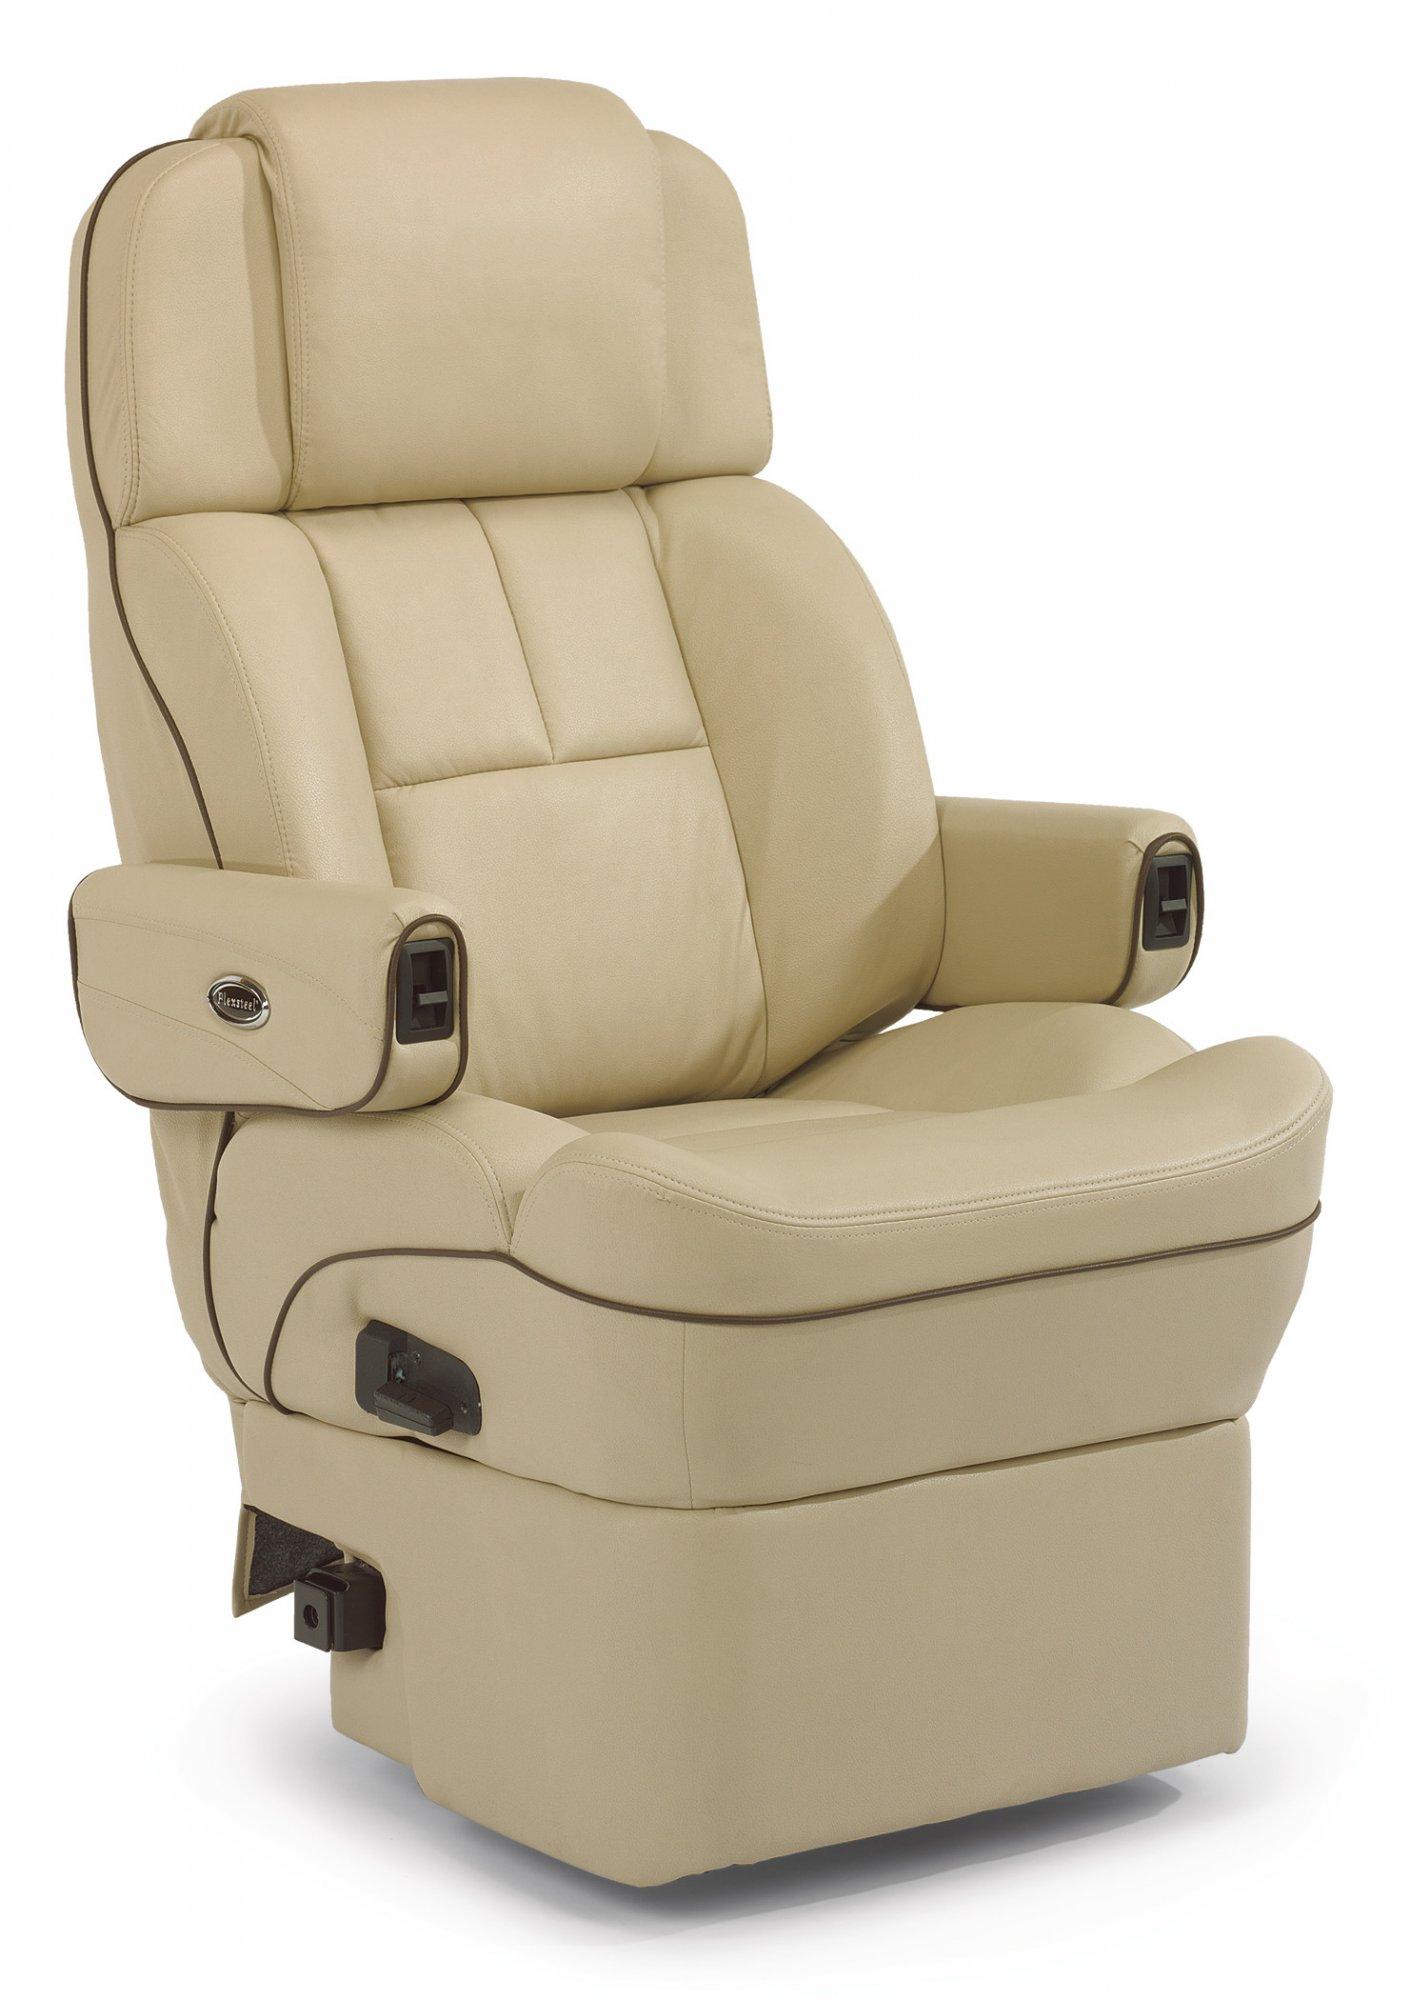 267 BUSR__RV1167_DL?Vxxyv2UvZsRDg9QpbbNOKtdmxZVT.eS_&itok=s8f73Qgu scopan flexsteel com Flexsteel RV Captain Chair Covers at bakdesigns.co